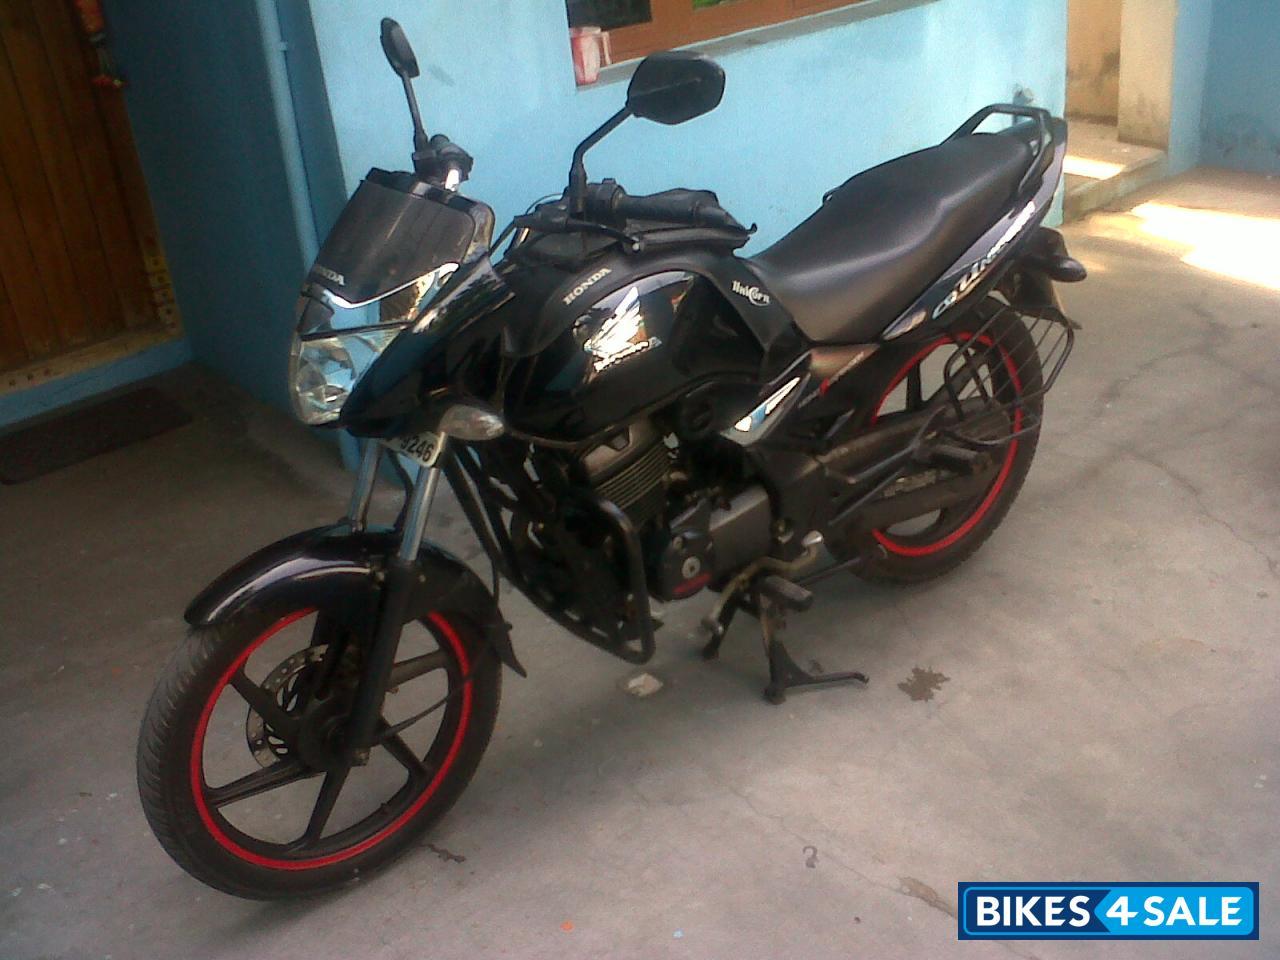 Block Honda Unicorn For Sale In Chennai Single Owner